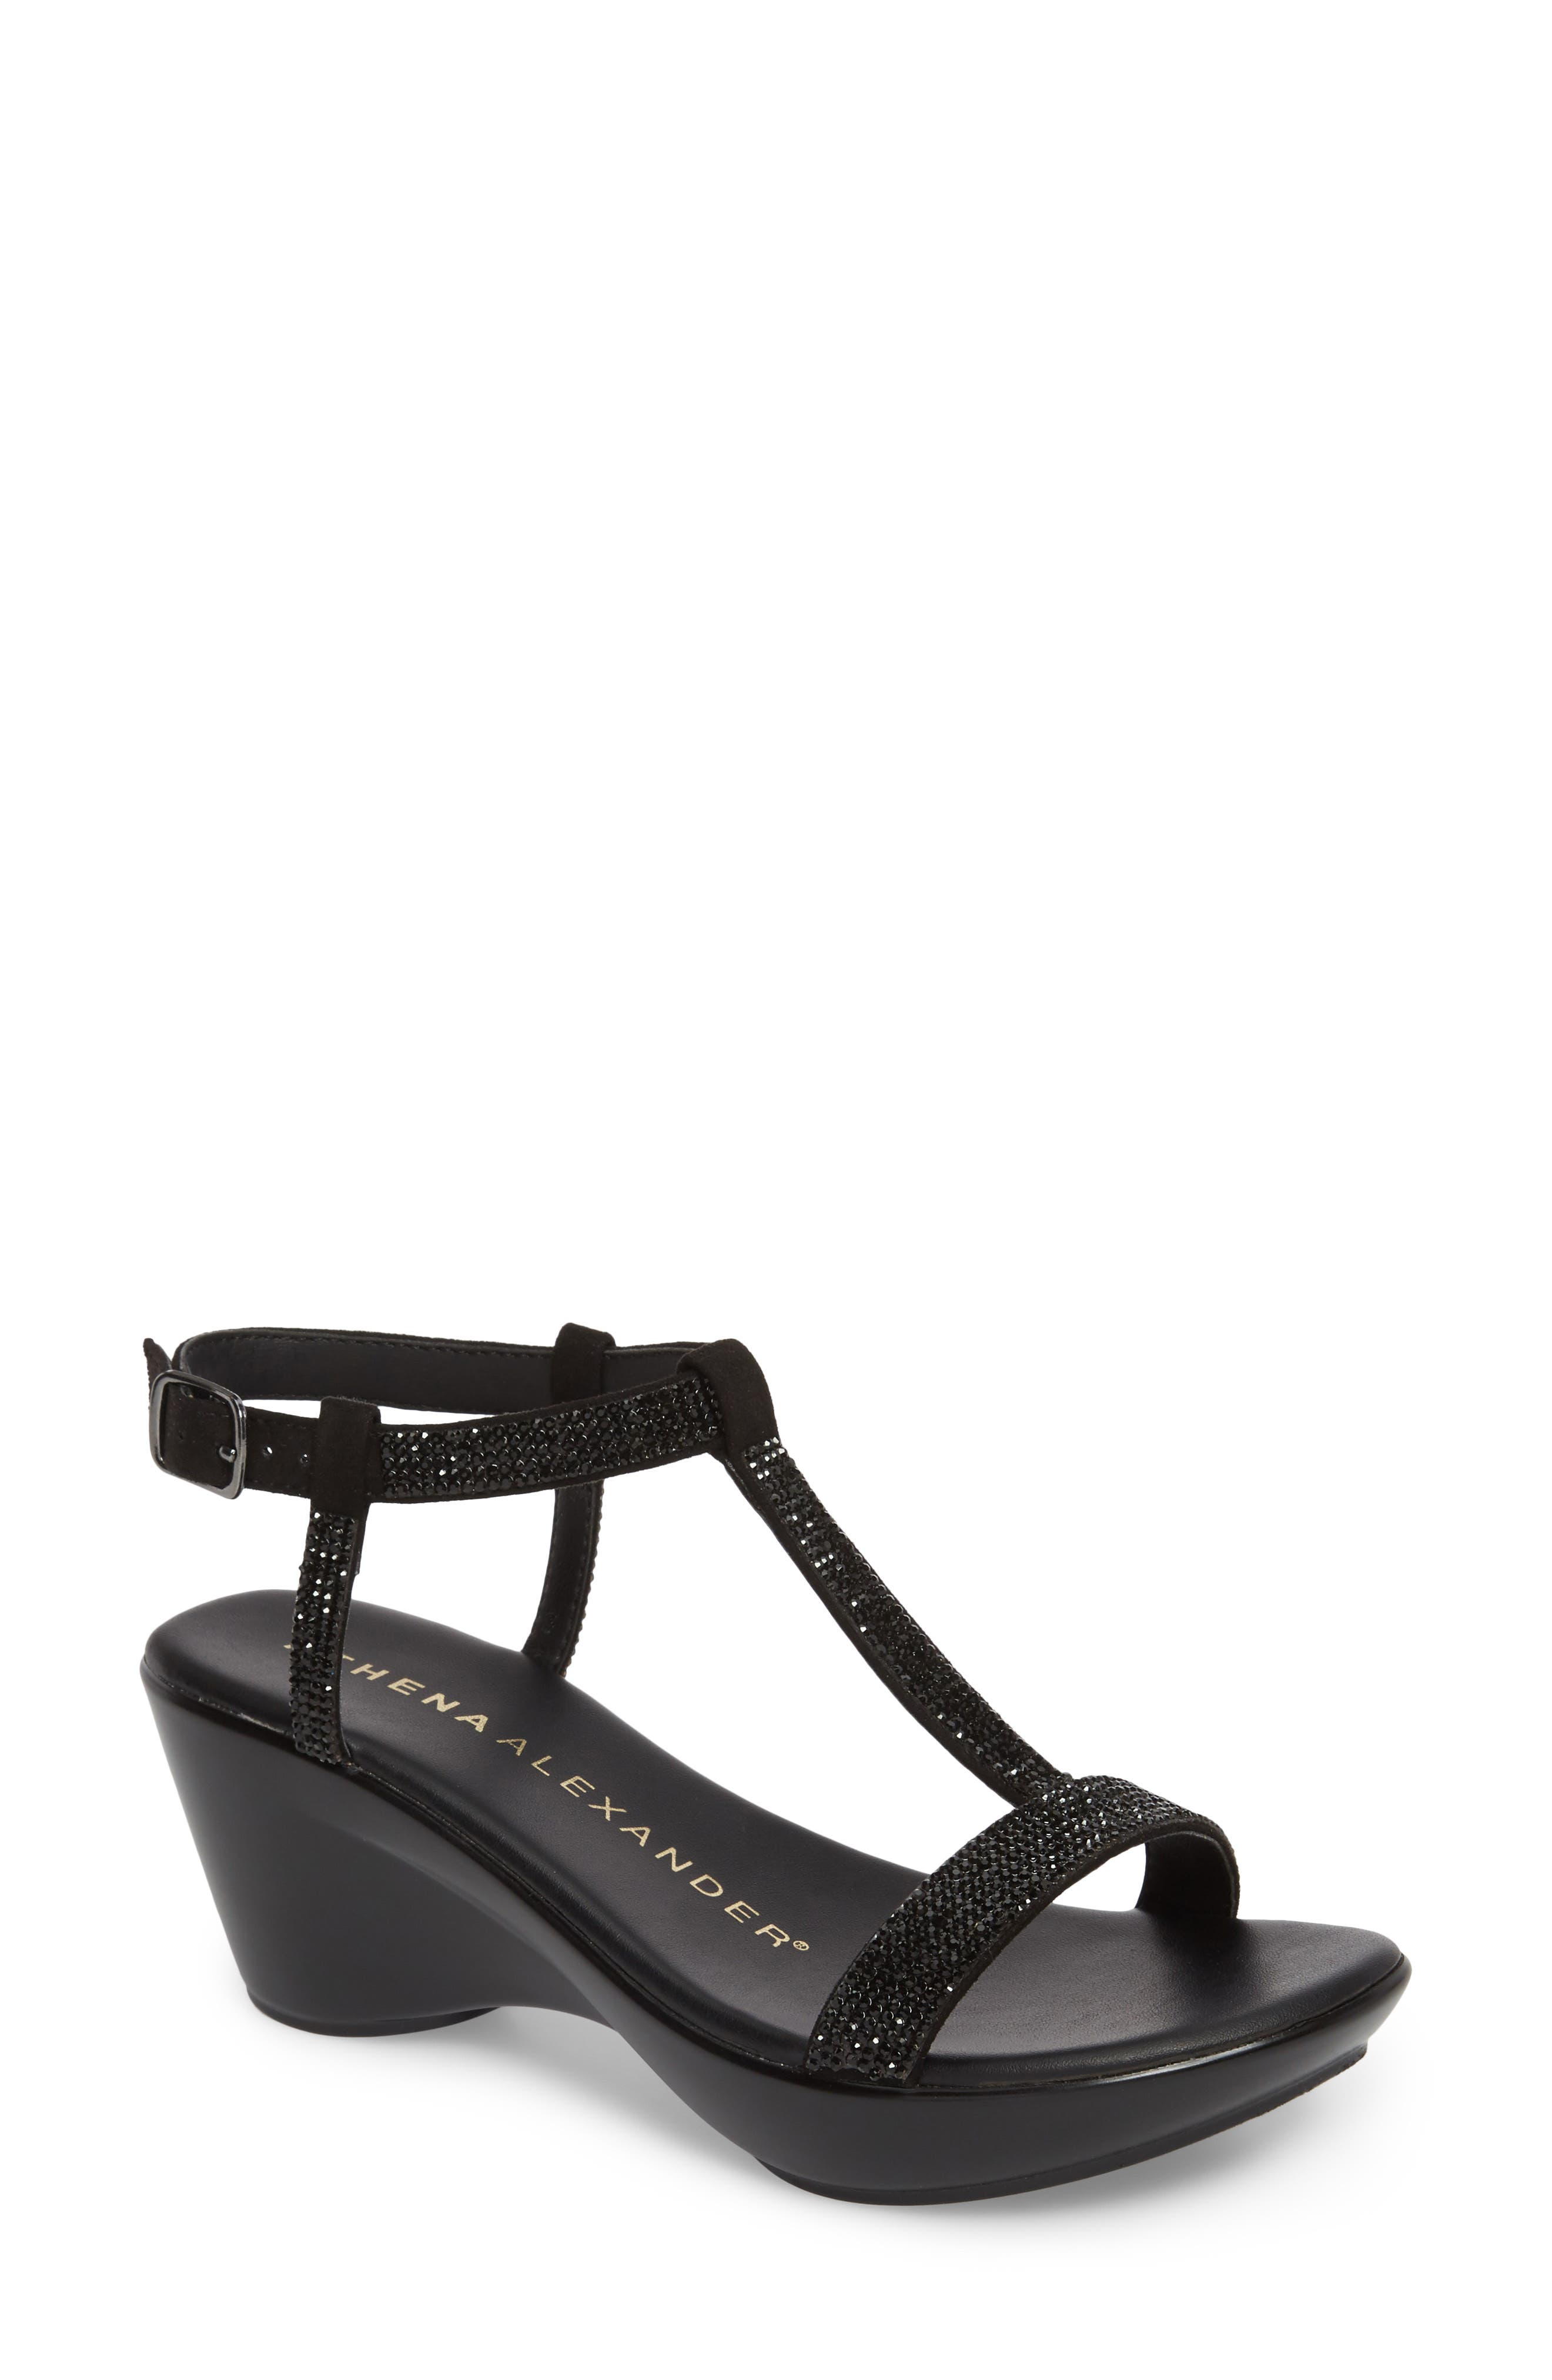 Athena Alexandar Karinya Embellished Strappy Wedge Sandal,                             Main thumbnail 1, color,                             BLACK SUEDE